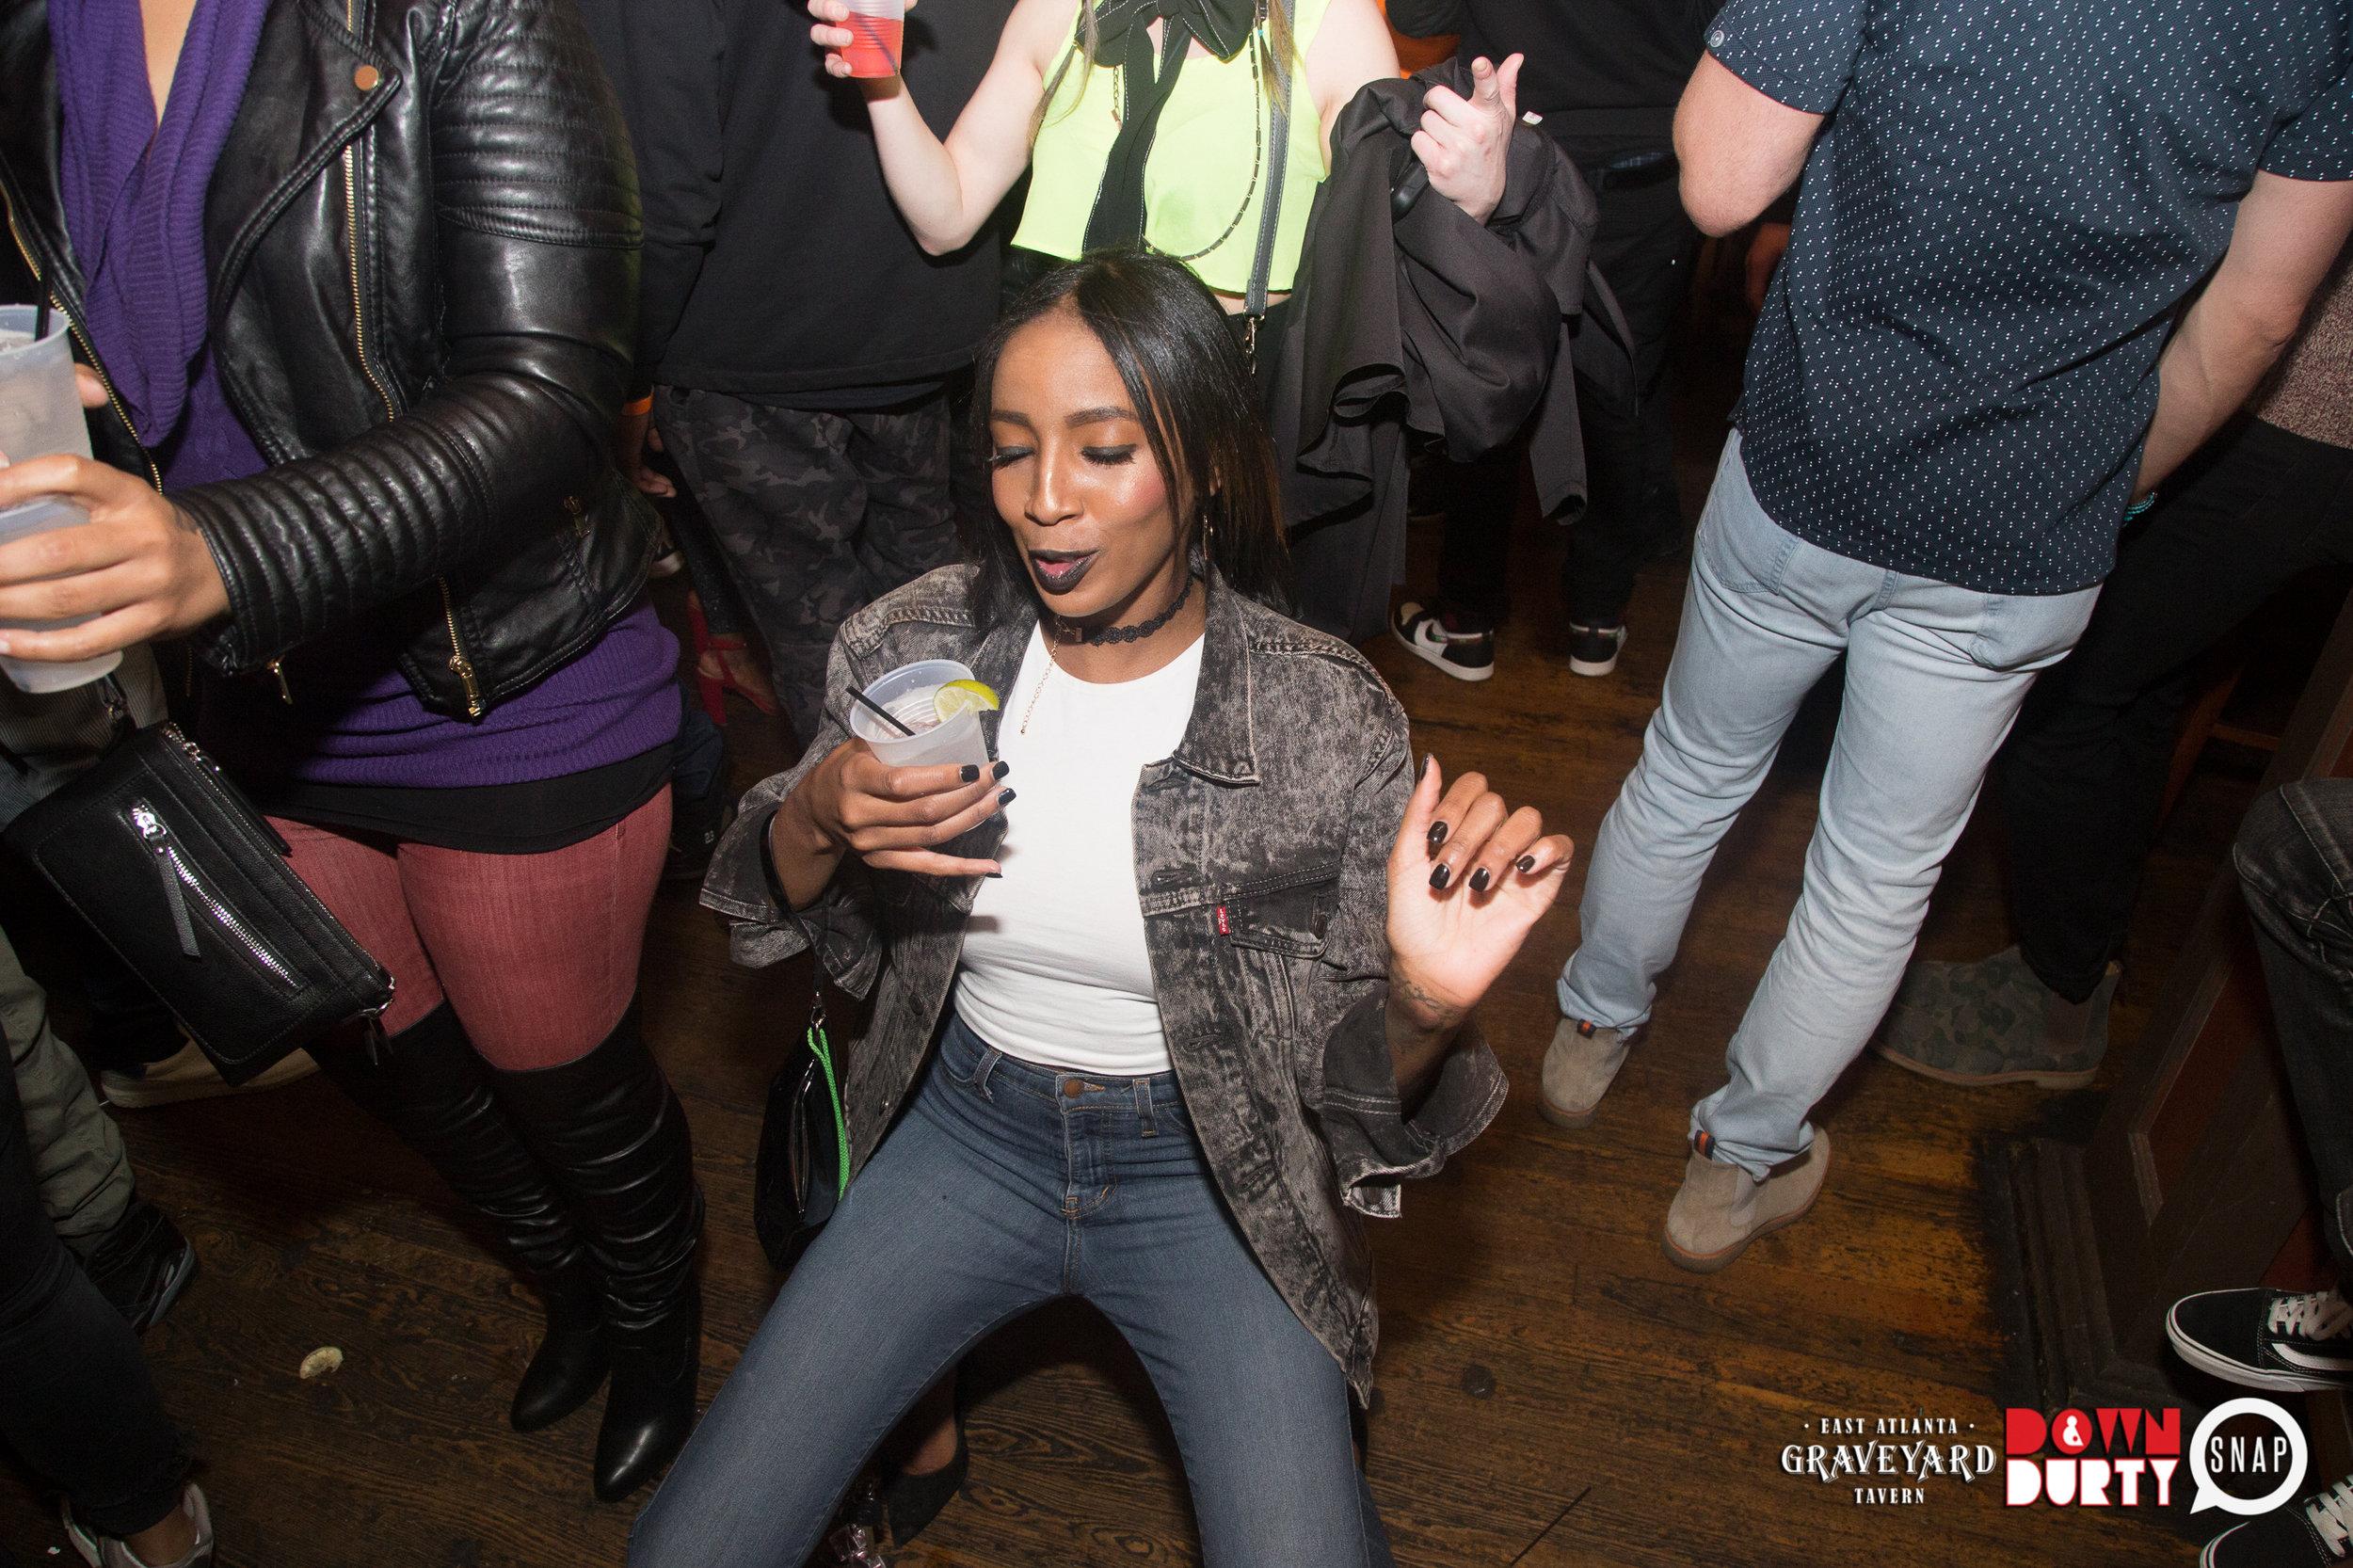 19Down n Durty Abril 2019 MJQ yojpgirlAki Oh Snap Kid Atlanta.JPG